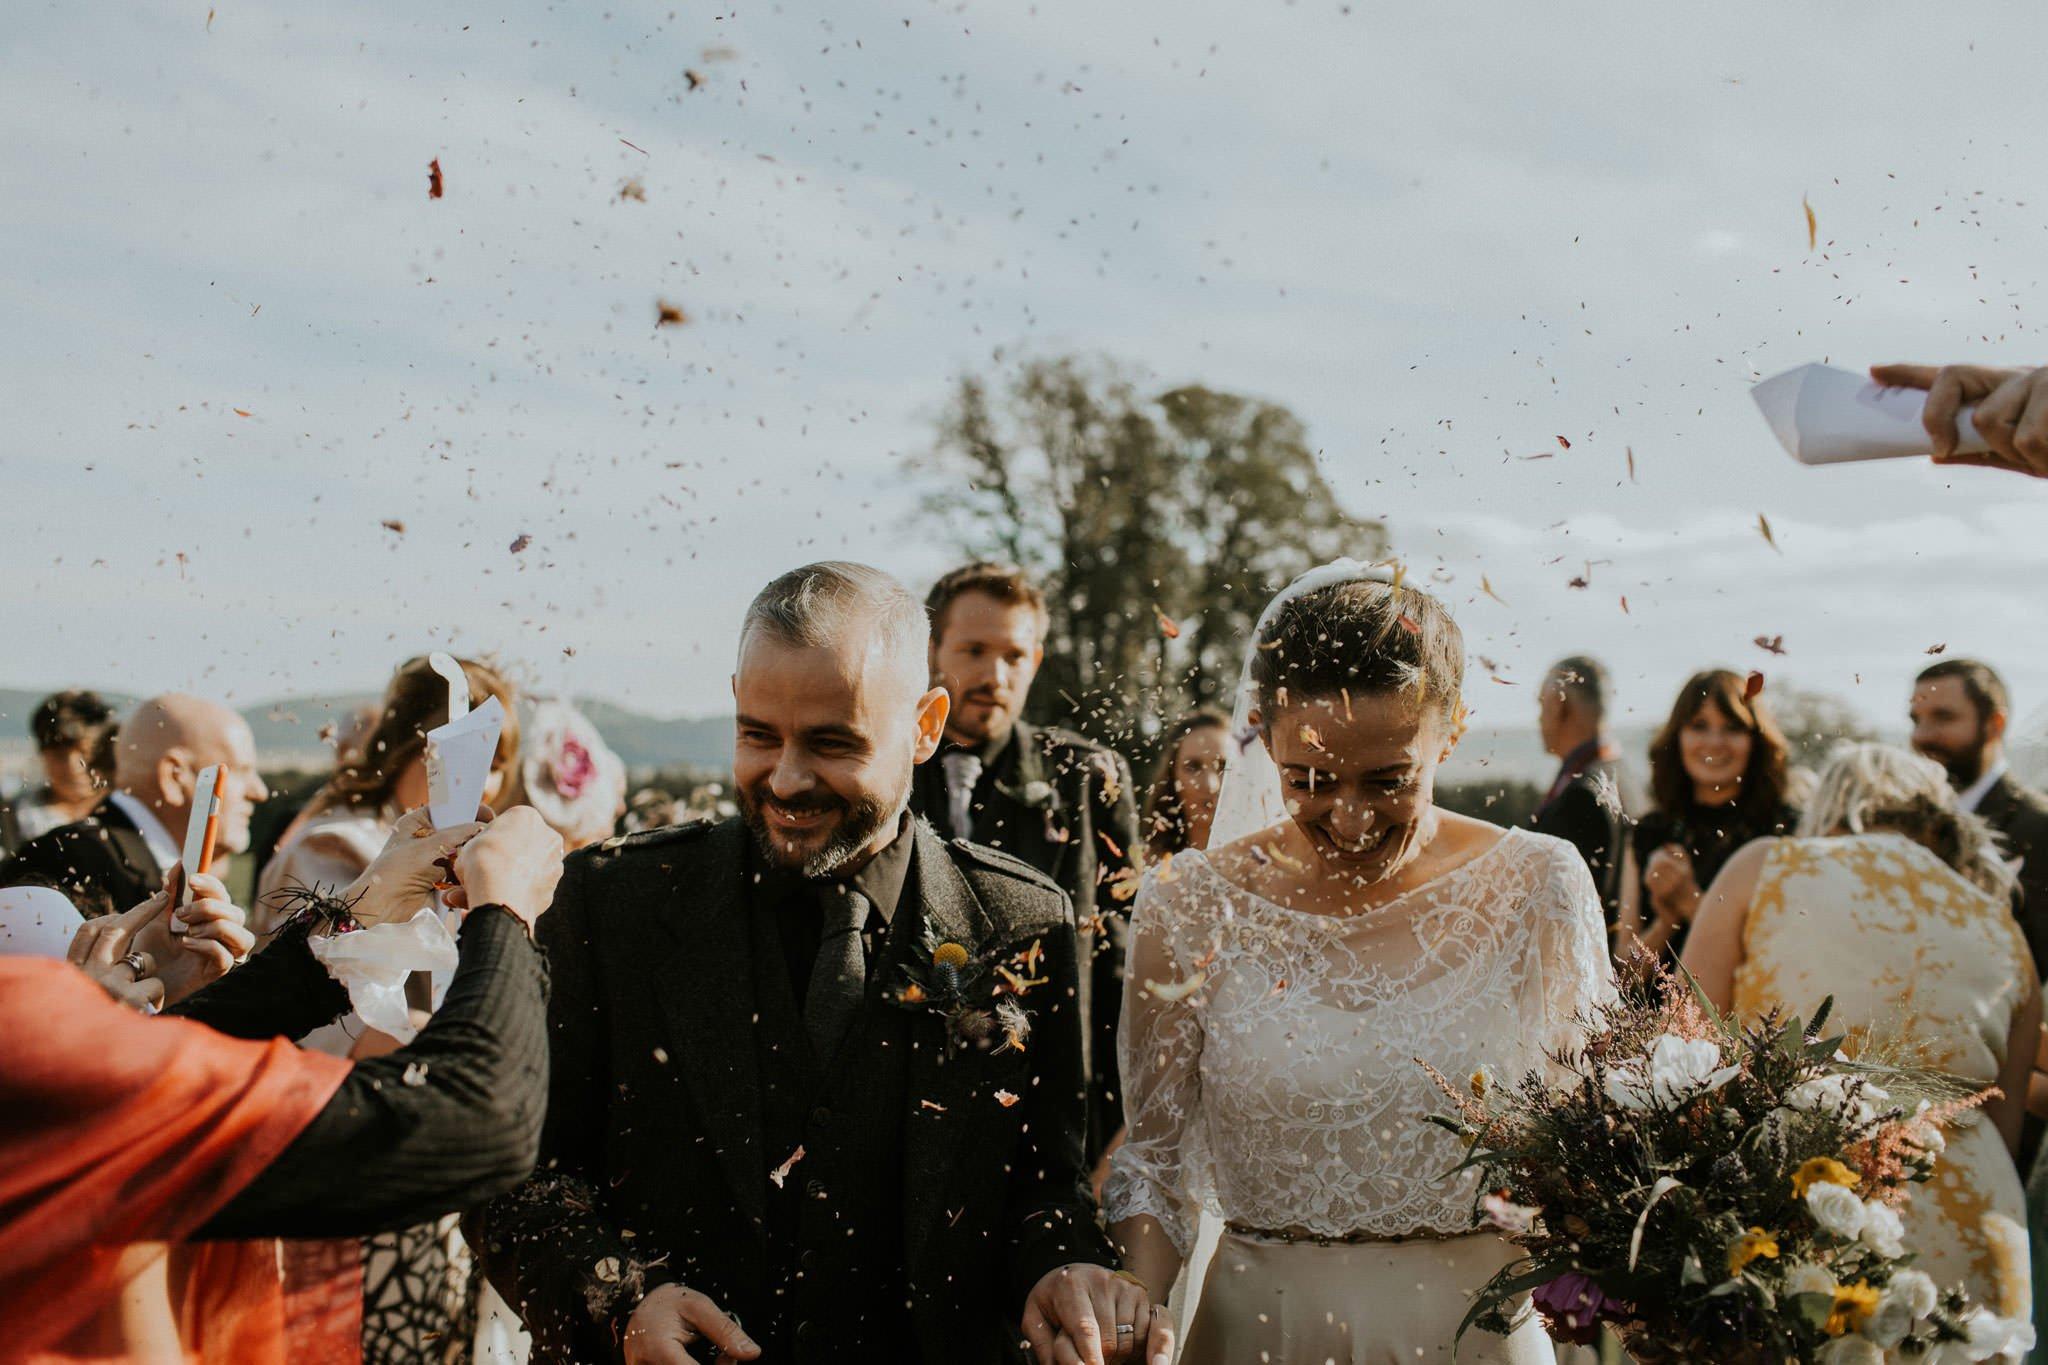 fine-art-wedding-photography-scotland 062